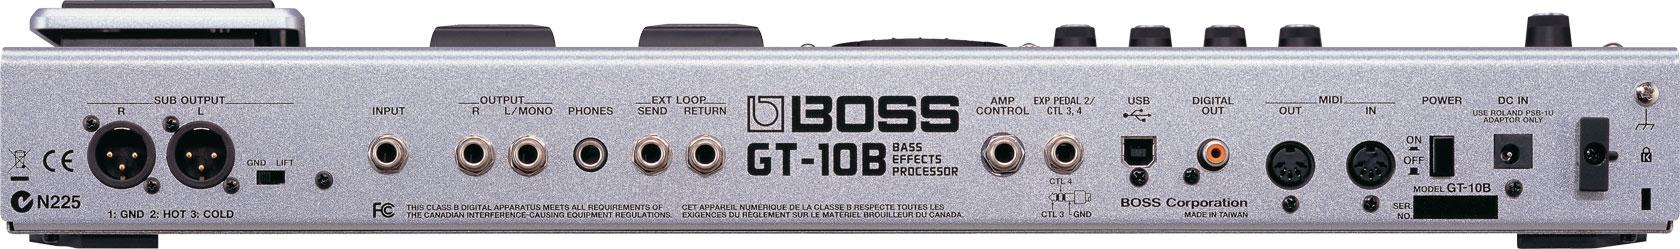 boss gt 10b bass effects processor rh boss info boss gt 10b manual gt 10 manual